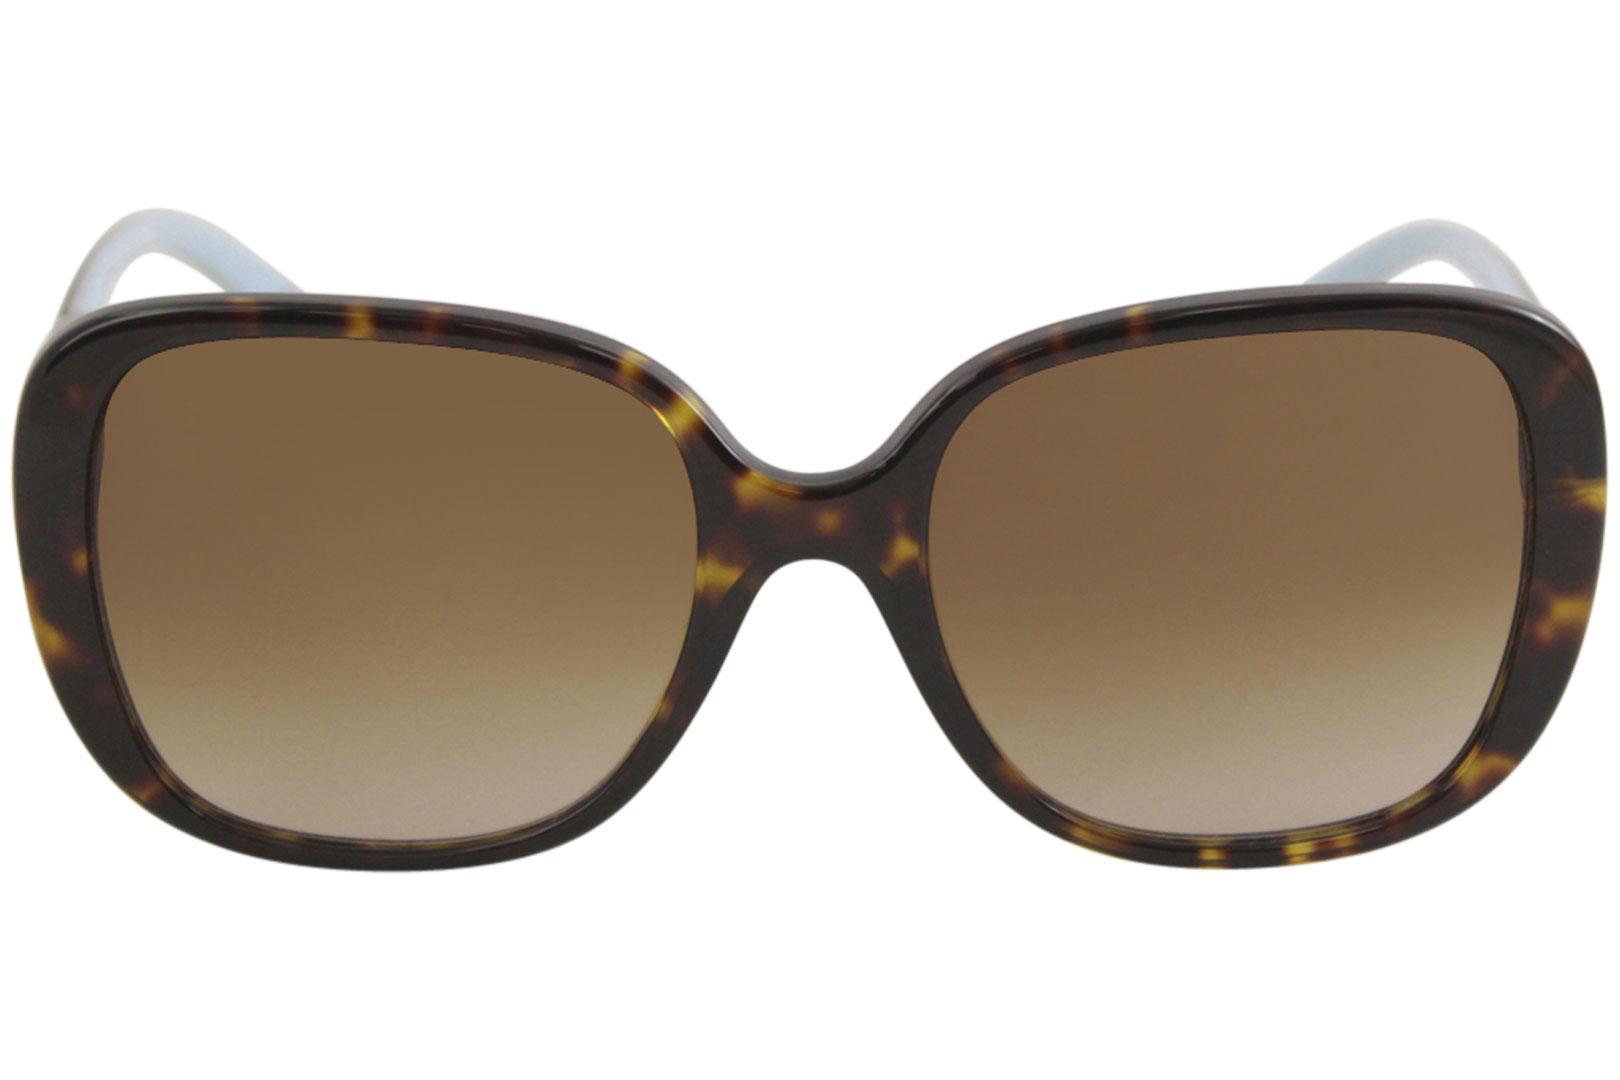 03d47cc033810 Women s TF4137B TF 4137 B Fashion Round Sunglasses by Tiffany   Co.